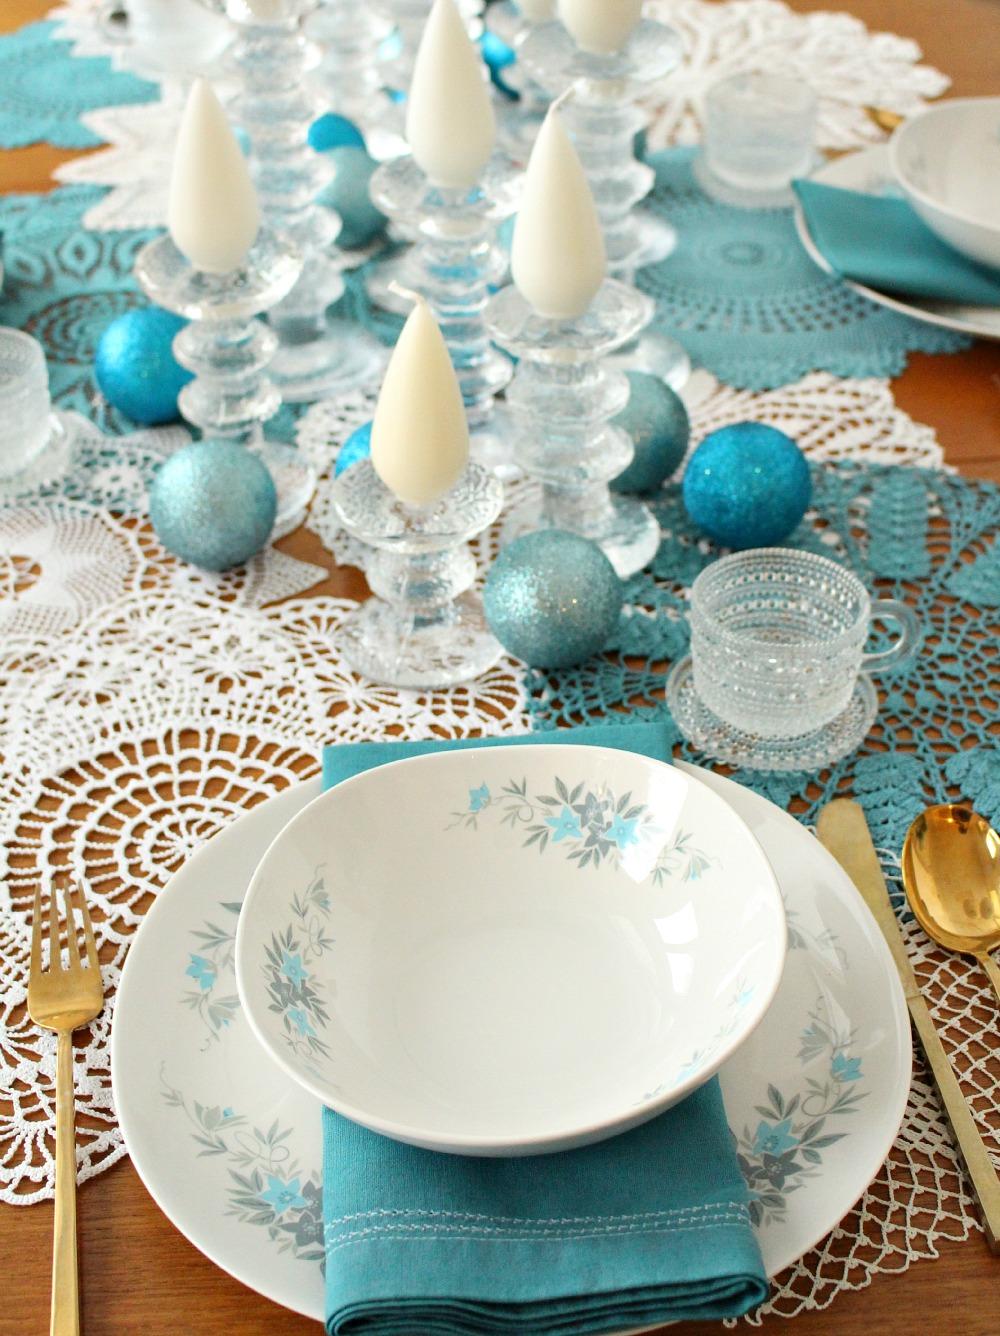 Iittala festivo collection